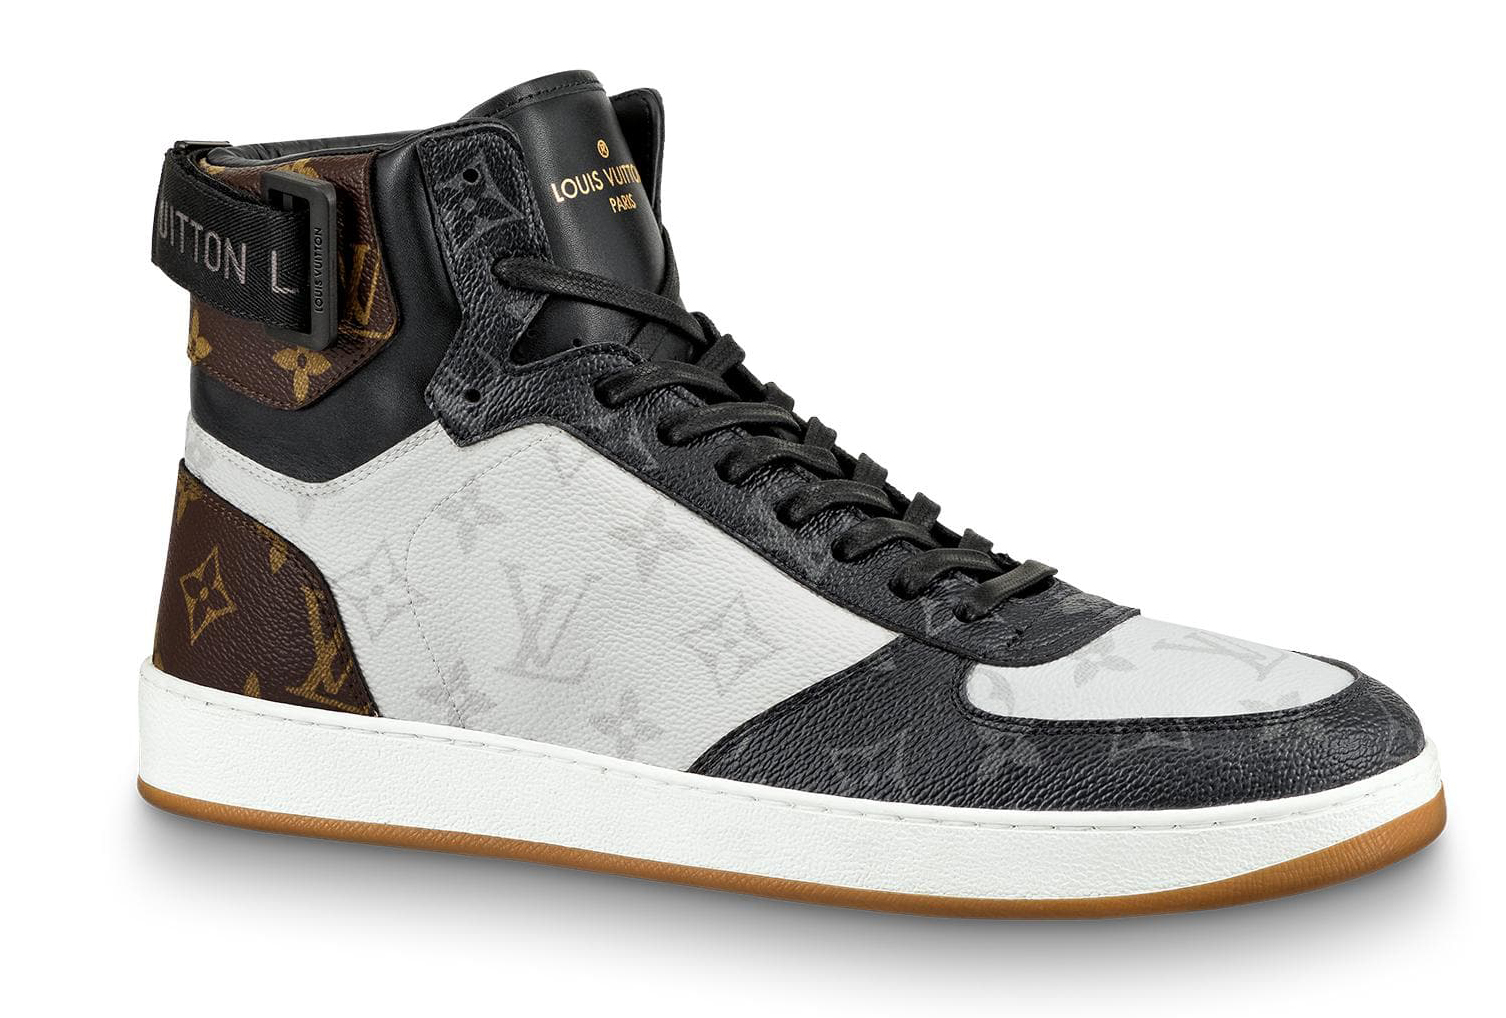 Louis Vuitton Rivoli Sneaker Boot